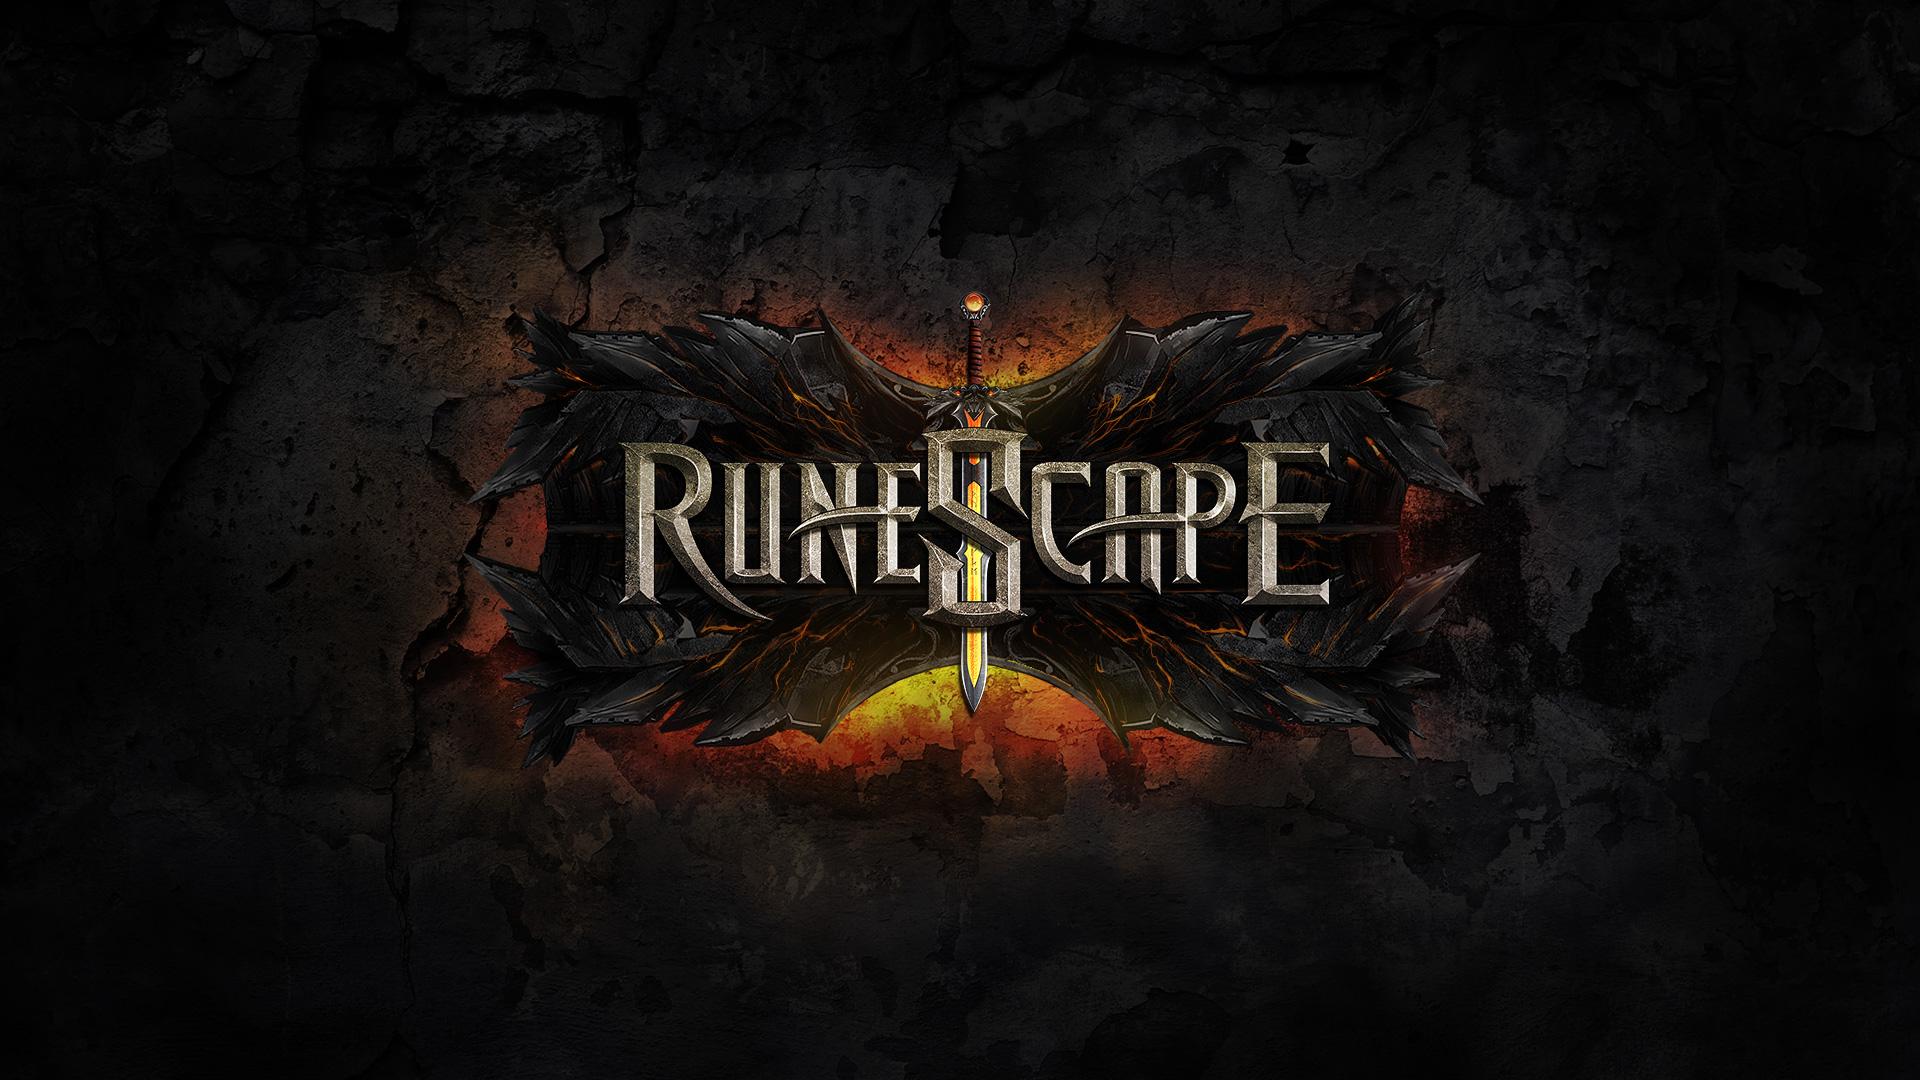 RUNESCAPE fantasy adventure poster wallpaper background 1920x1080